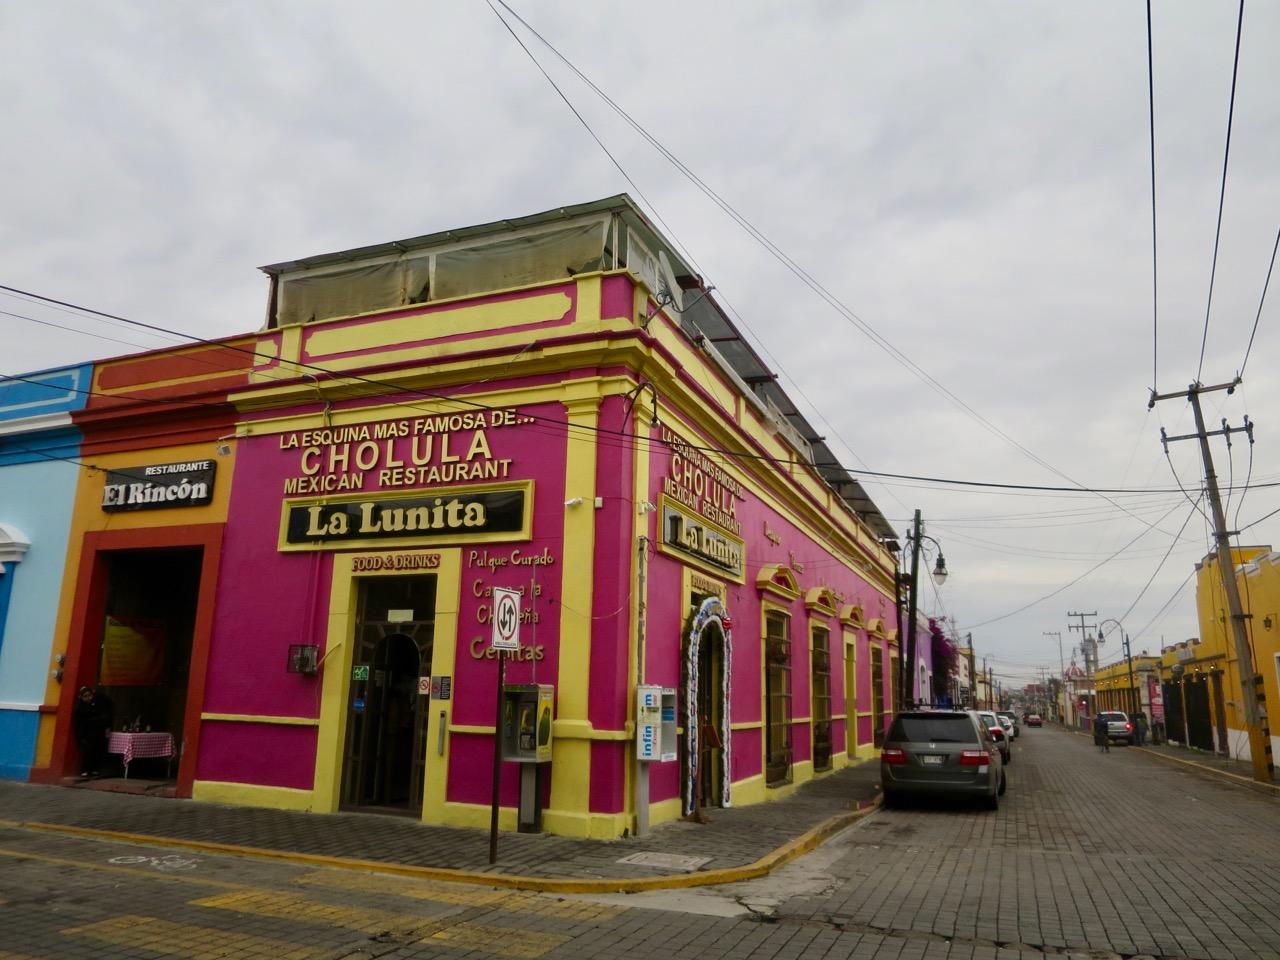 Cholula 1 15